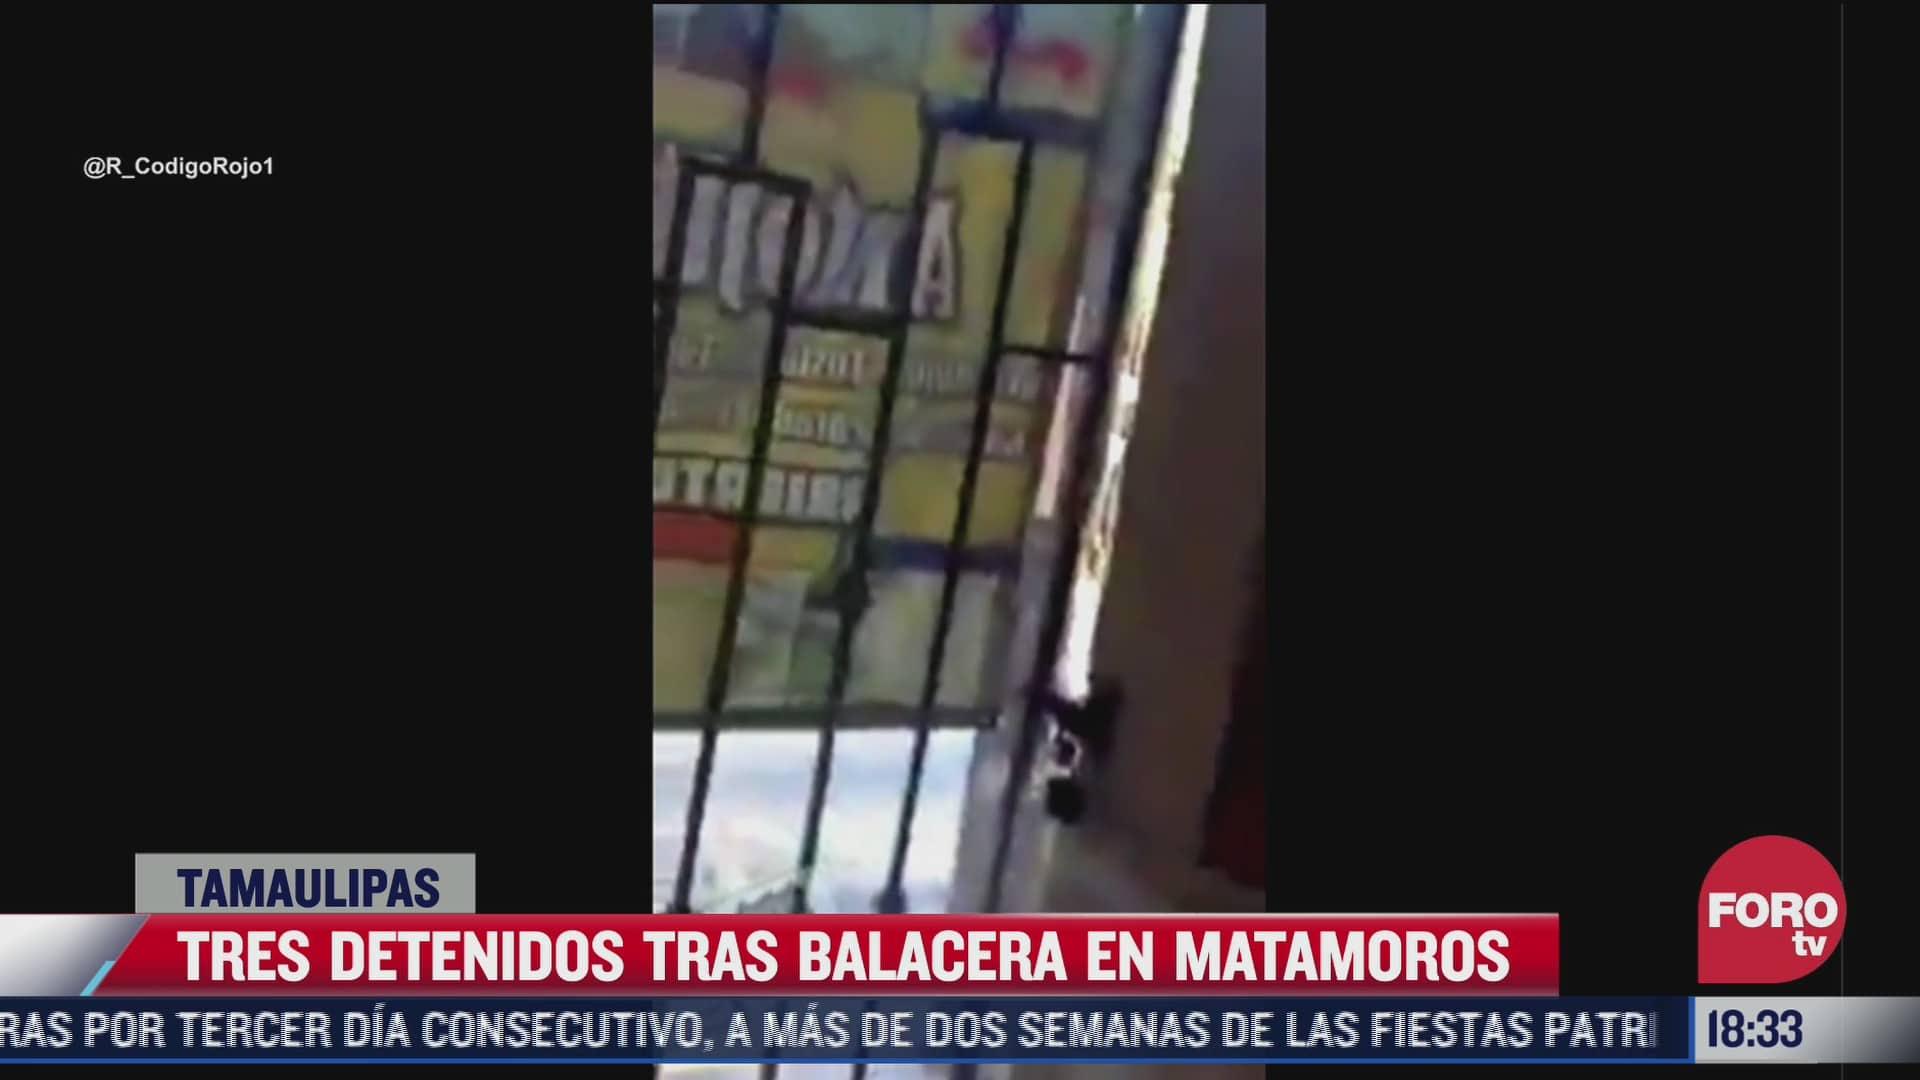 tres detenidos tras balacera en matamoros tamaulipas